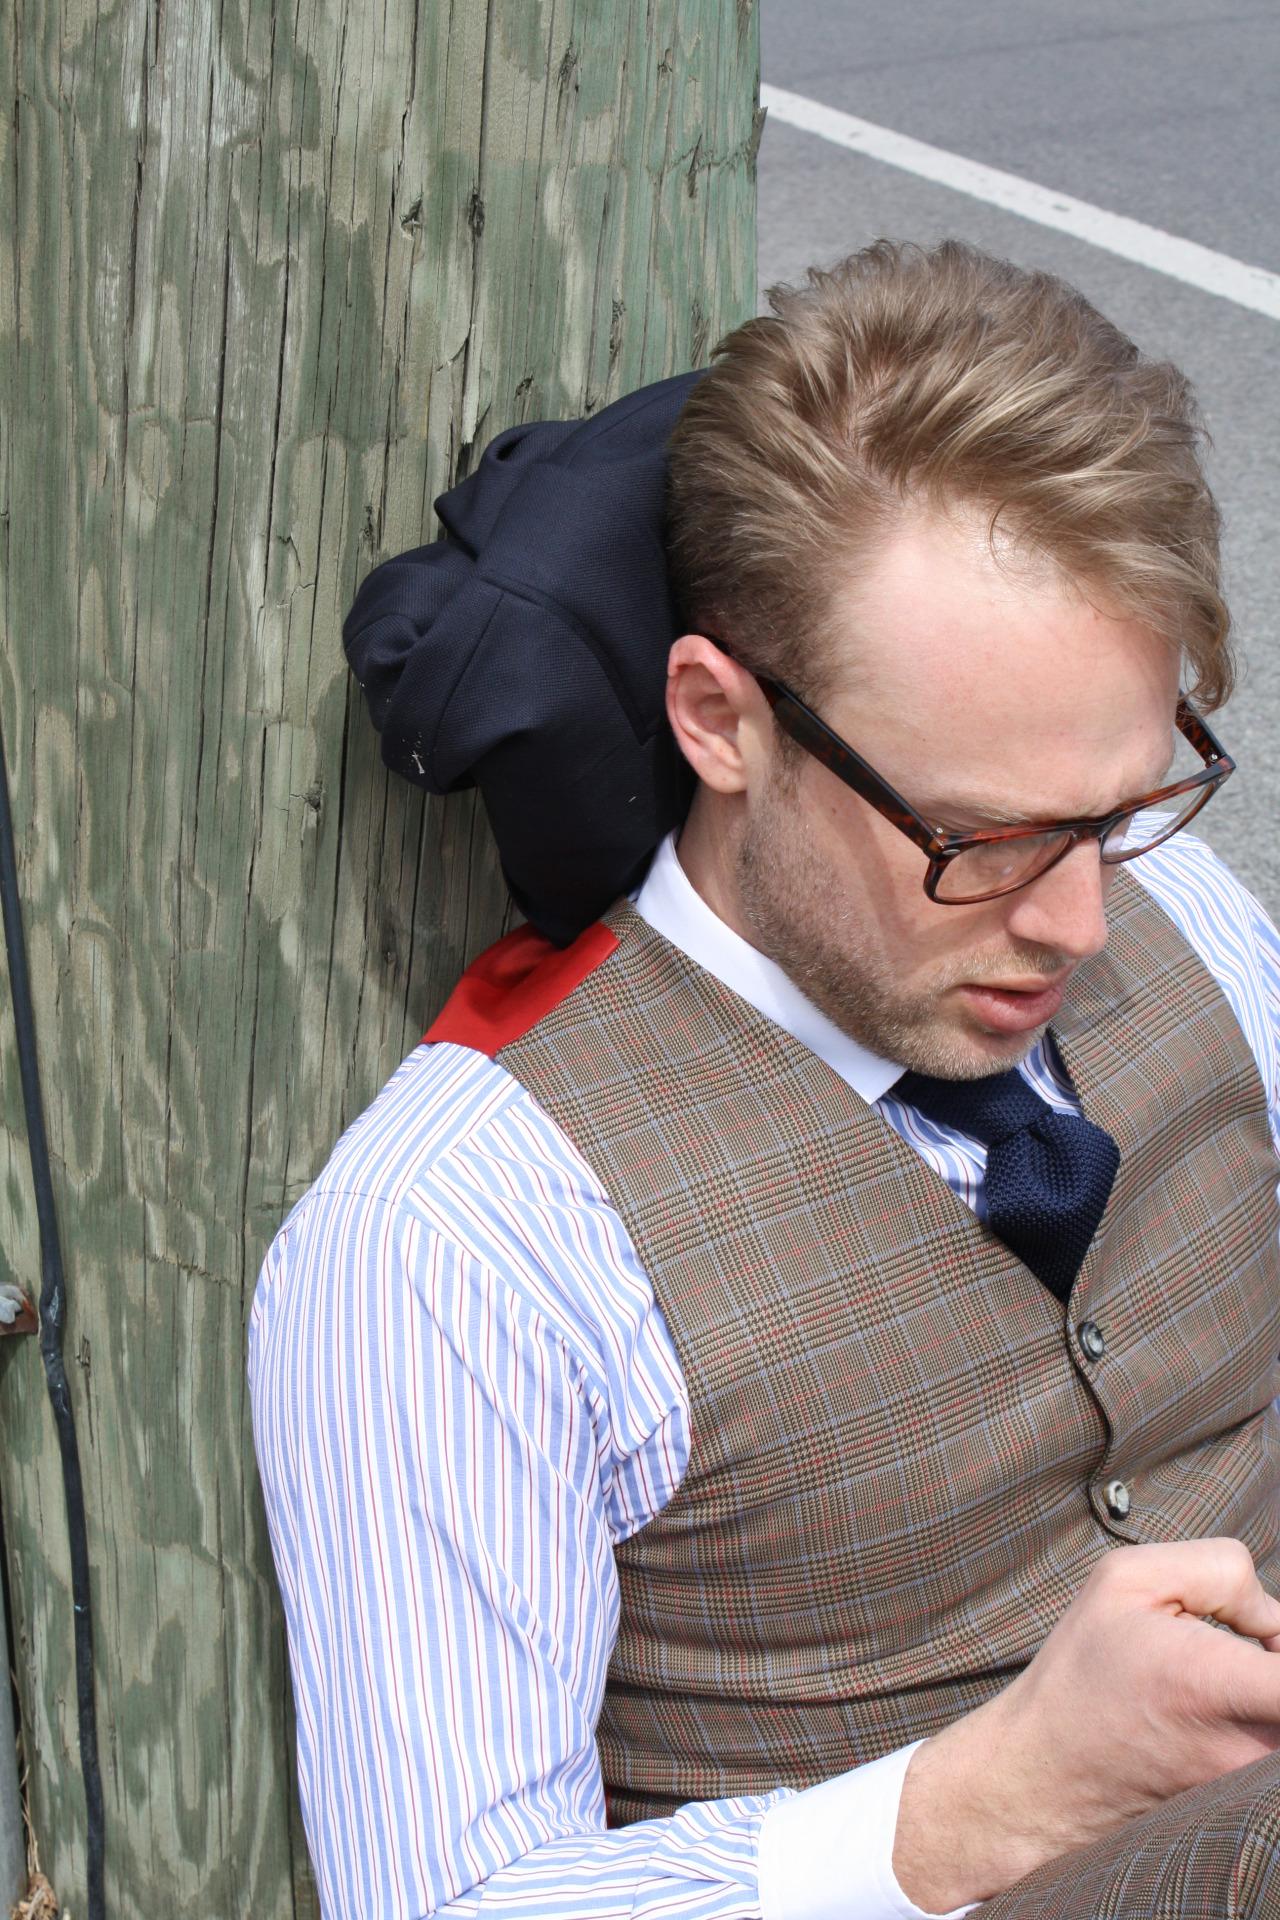 bespoke suit travel suit glasses blue striped shirt